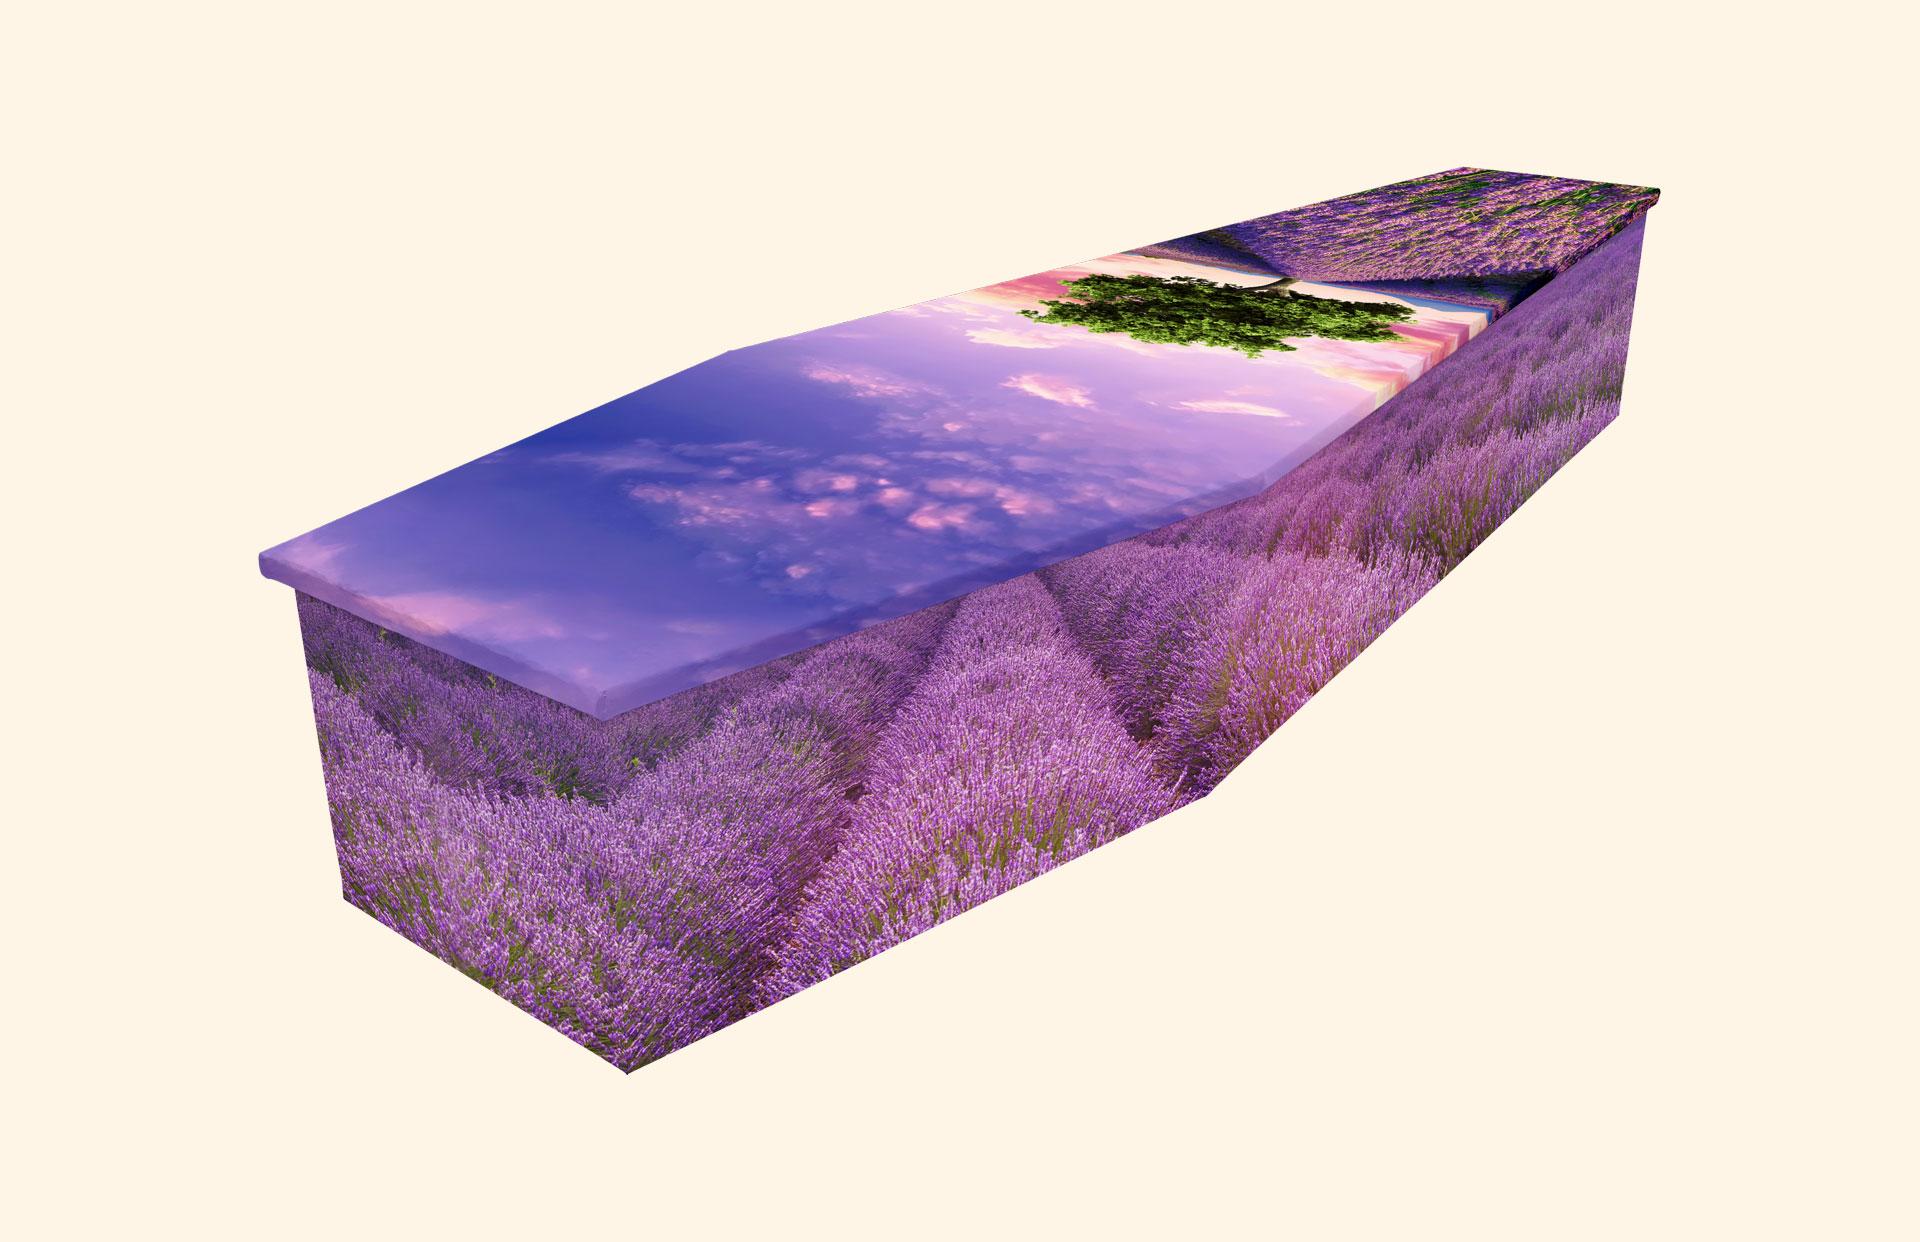 Lavender Field Cardboard coffin